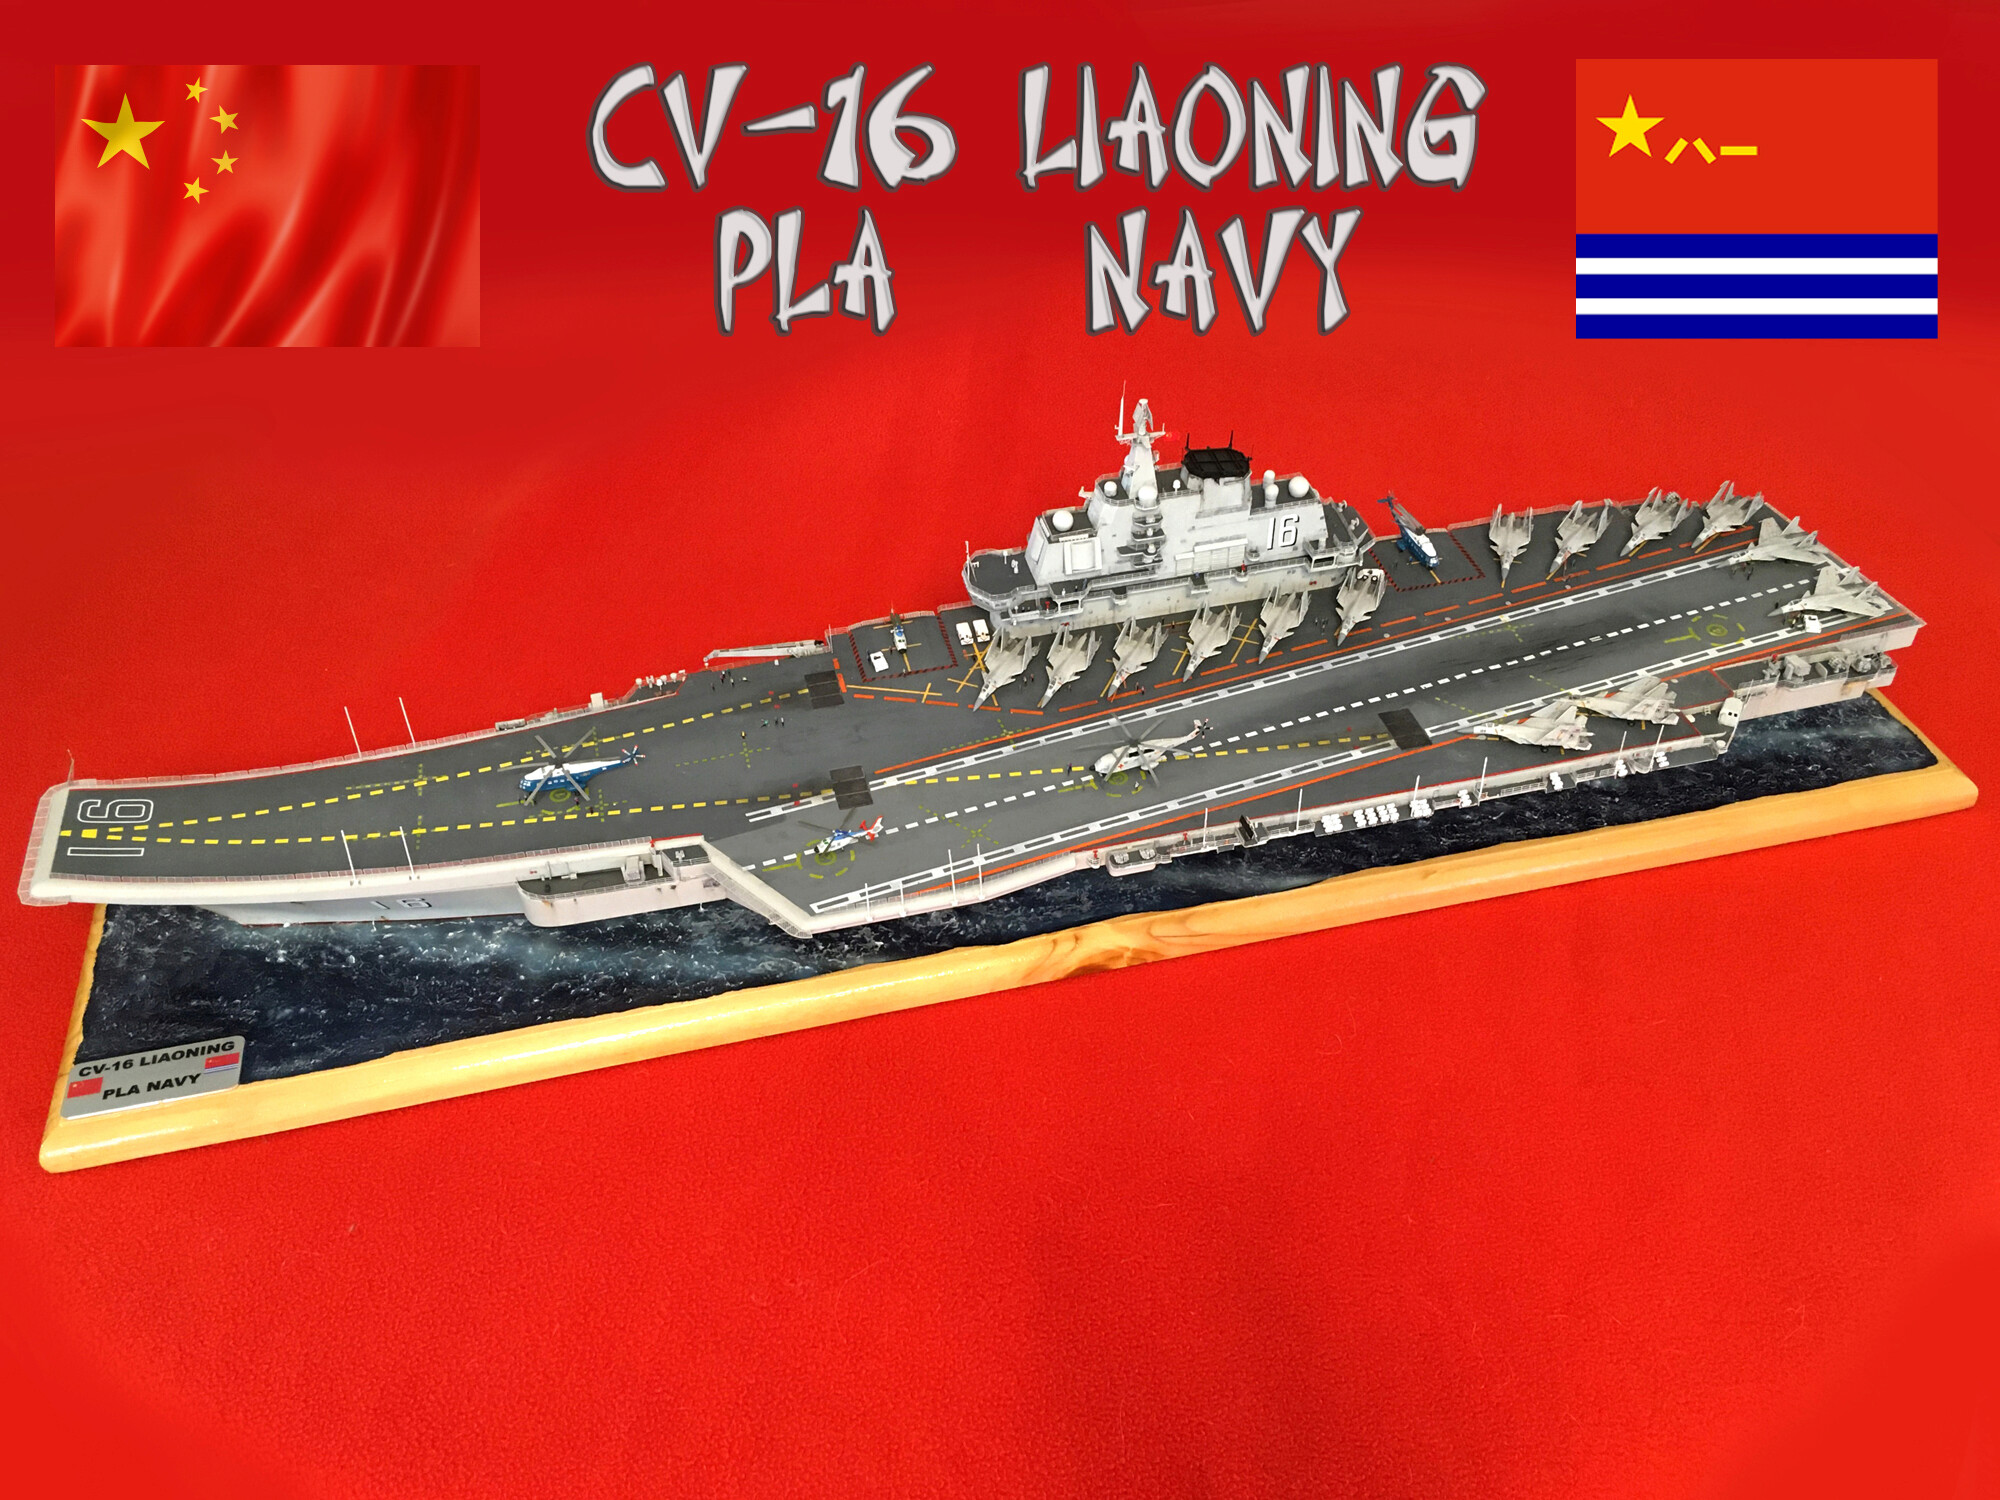 Porte-avions LIAONING CV-16 (PLA Navy) Liaon199